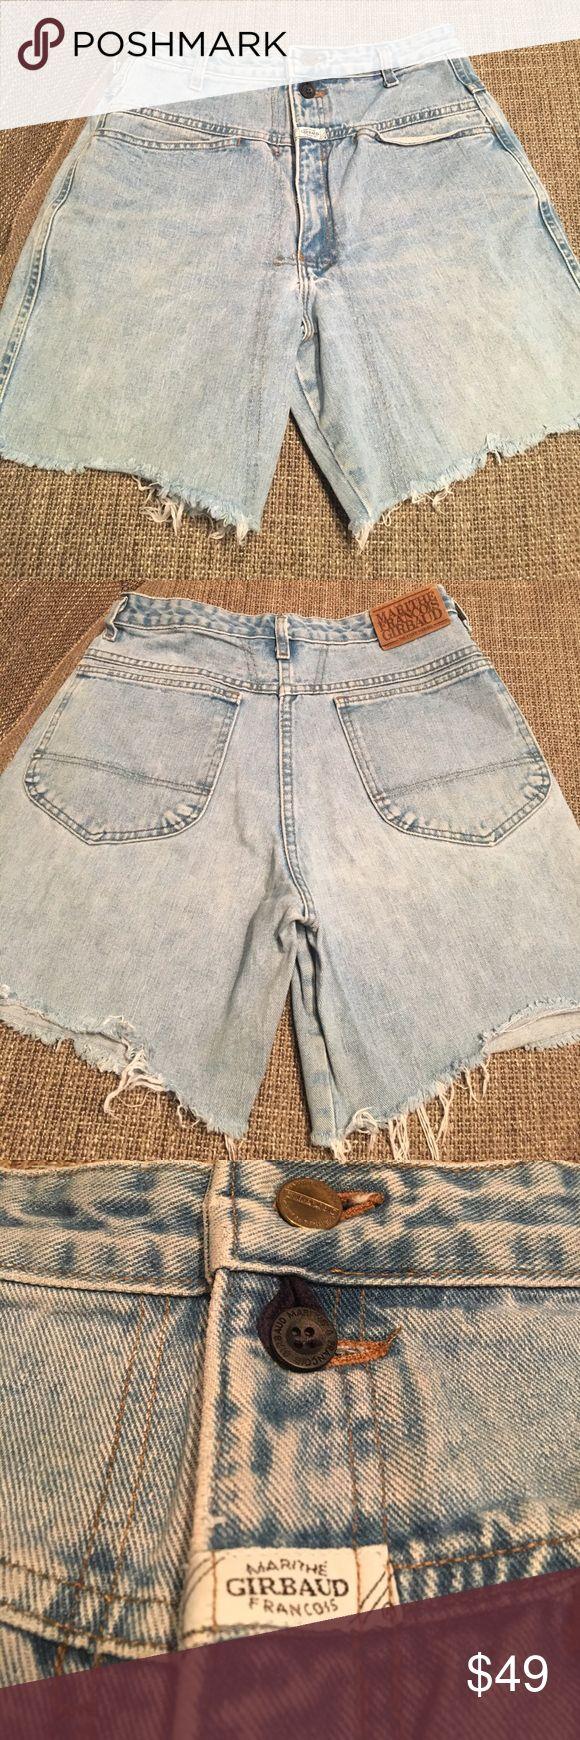 "Marithe Francois Girbaud vintage denim cut offs Girbaud vintage high waist denim shorts. Front yoke. Loop for second button closure. Inseam 6."". Rise 13"". Marithe Francois Girbaud Shorts Jean Shorts"